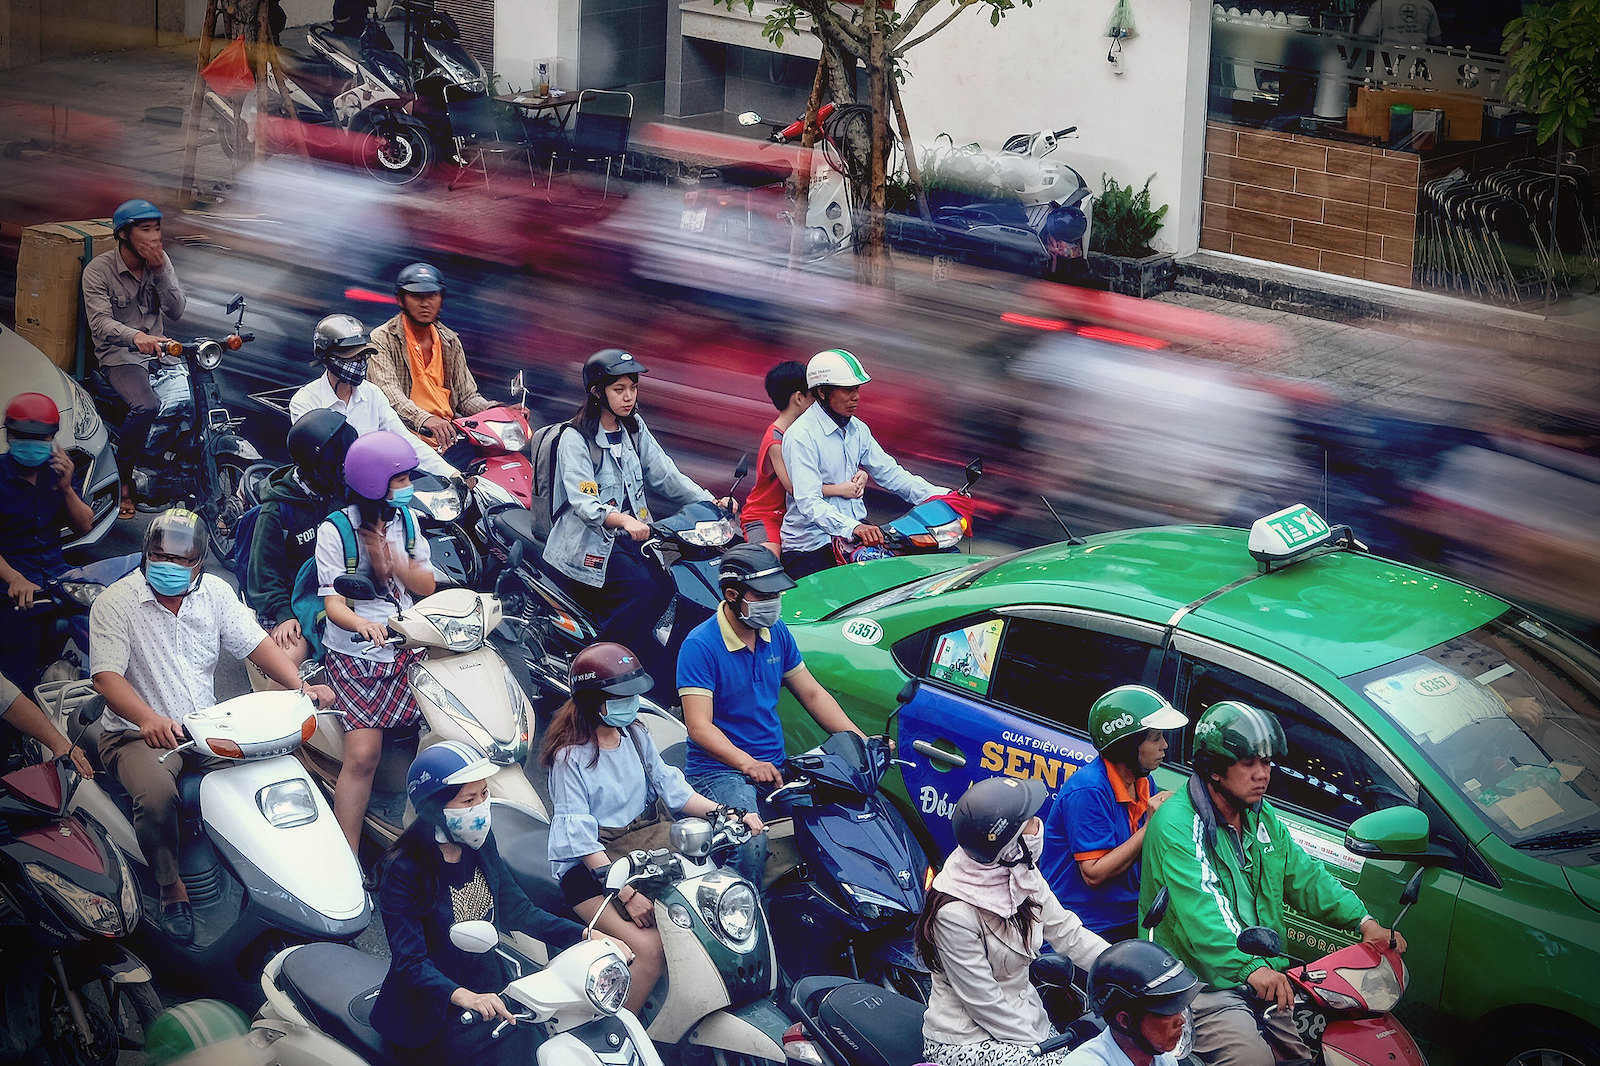 Image of a GrabTaxi in Saigon traffic